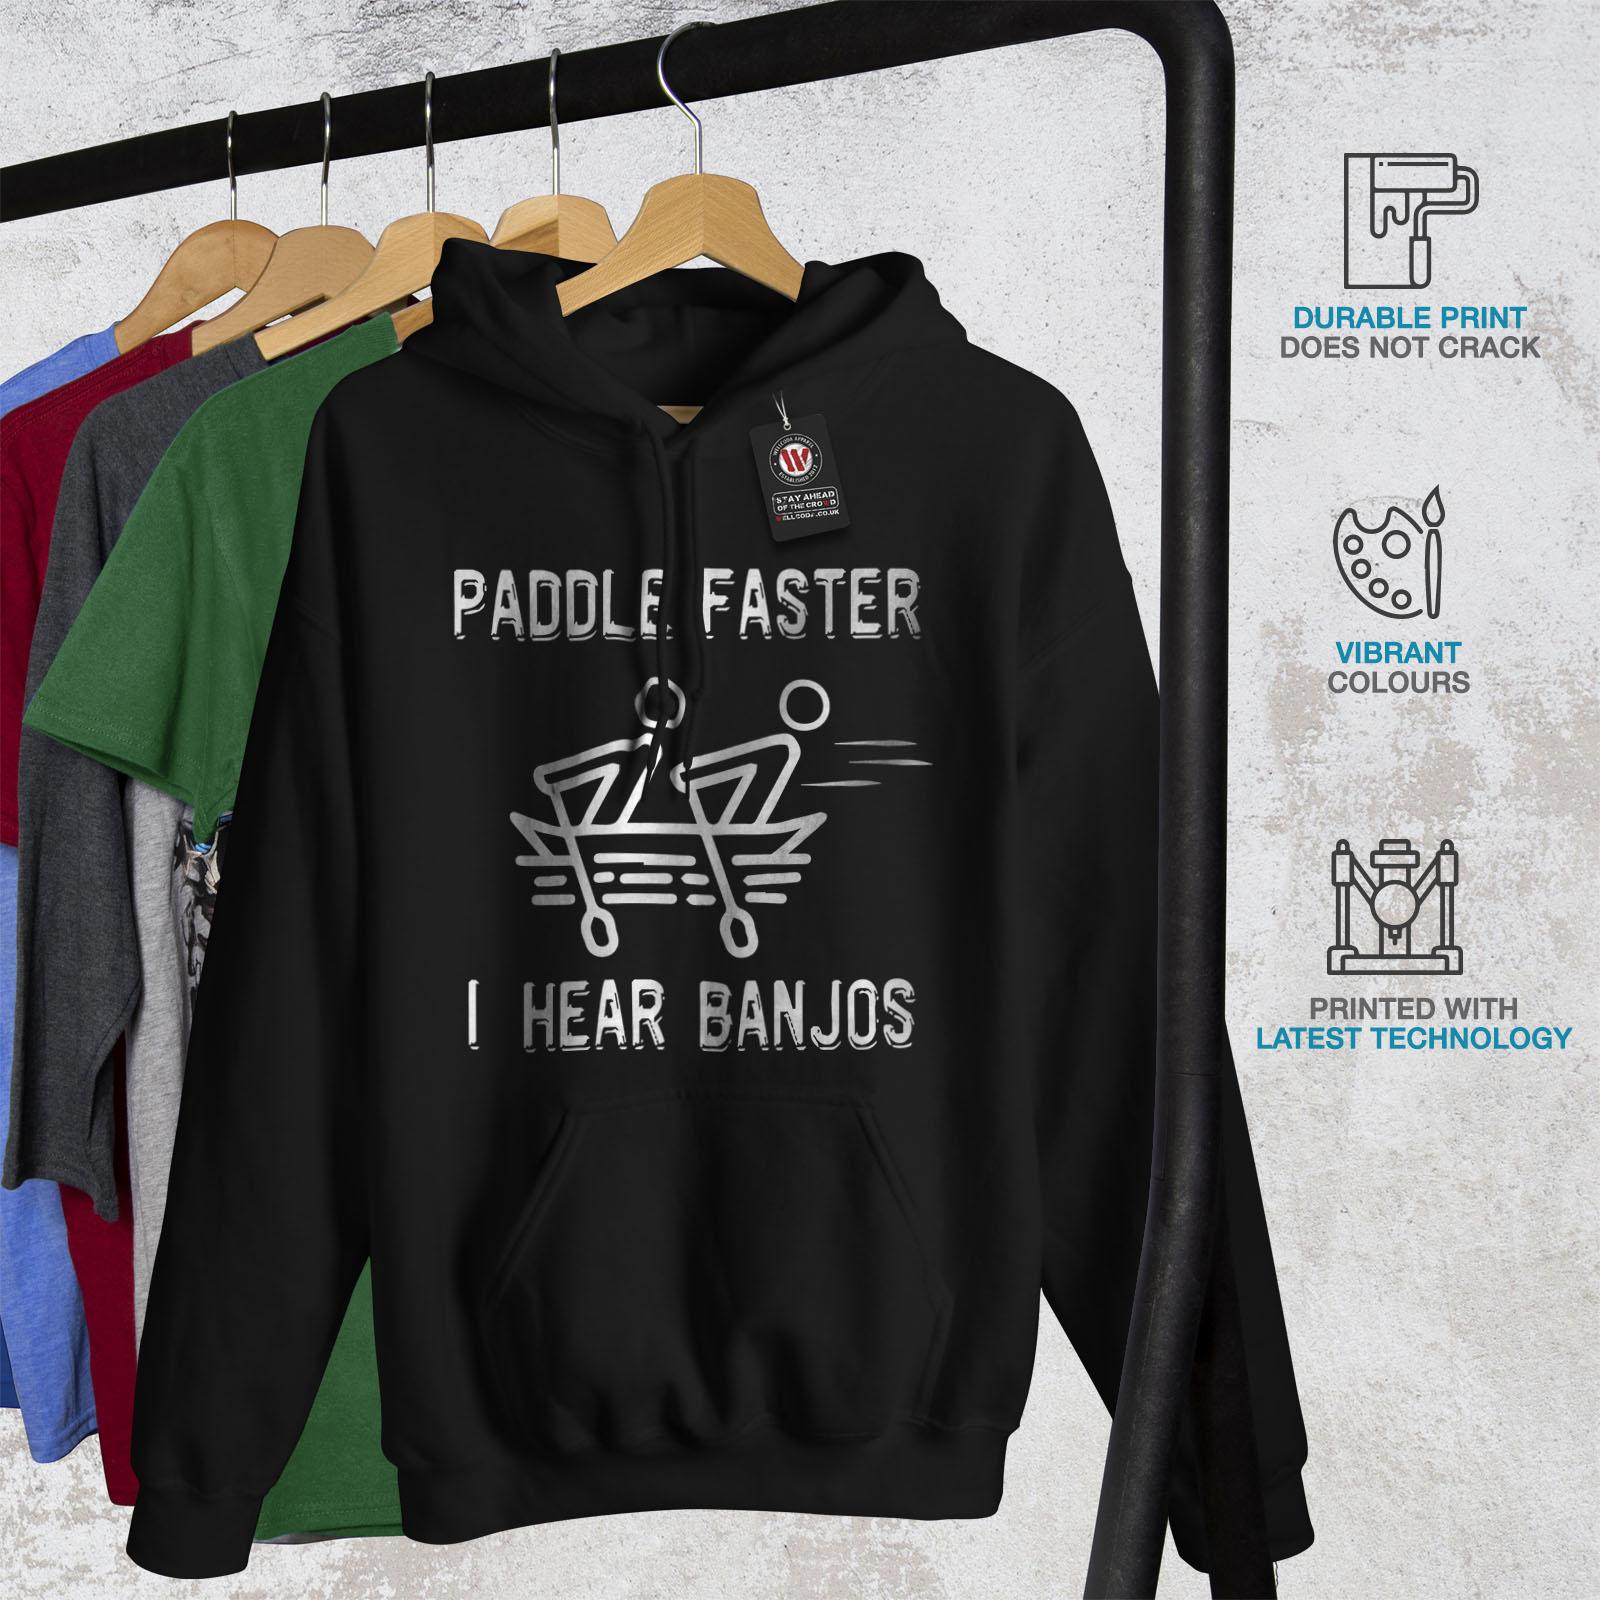 wellcoda Paddle Faster Mens Sweatshirt Hear Banjos Casual Jumper